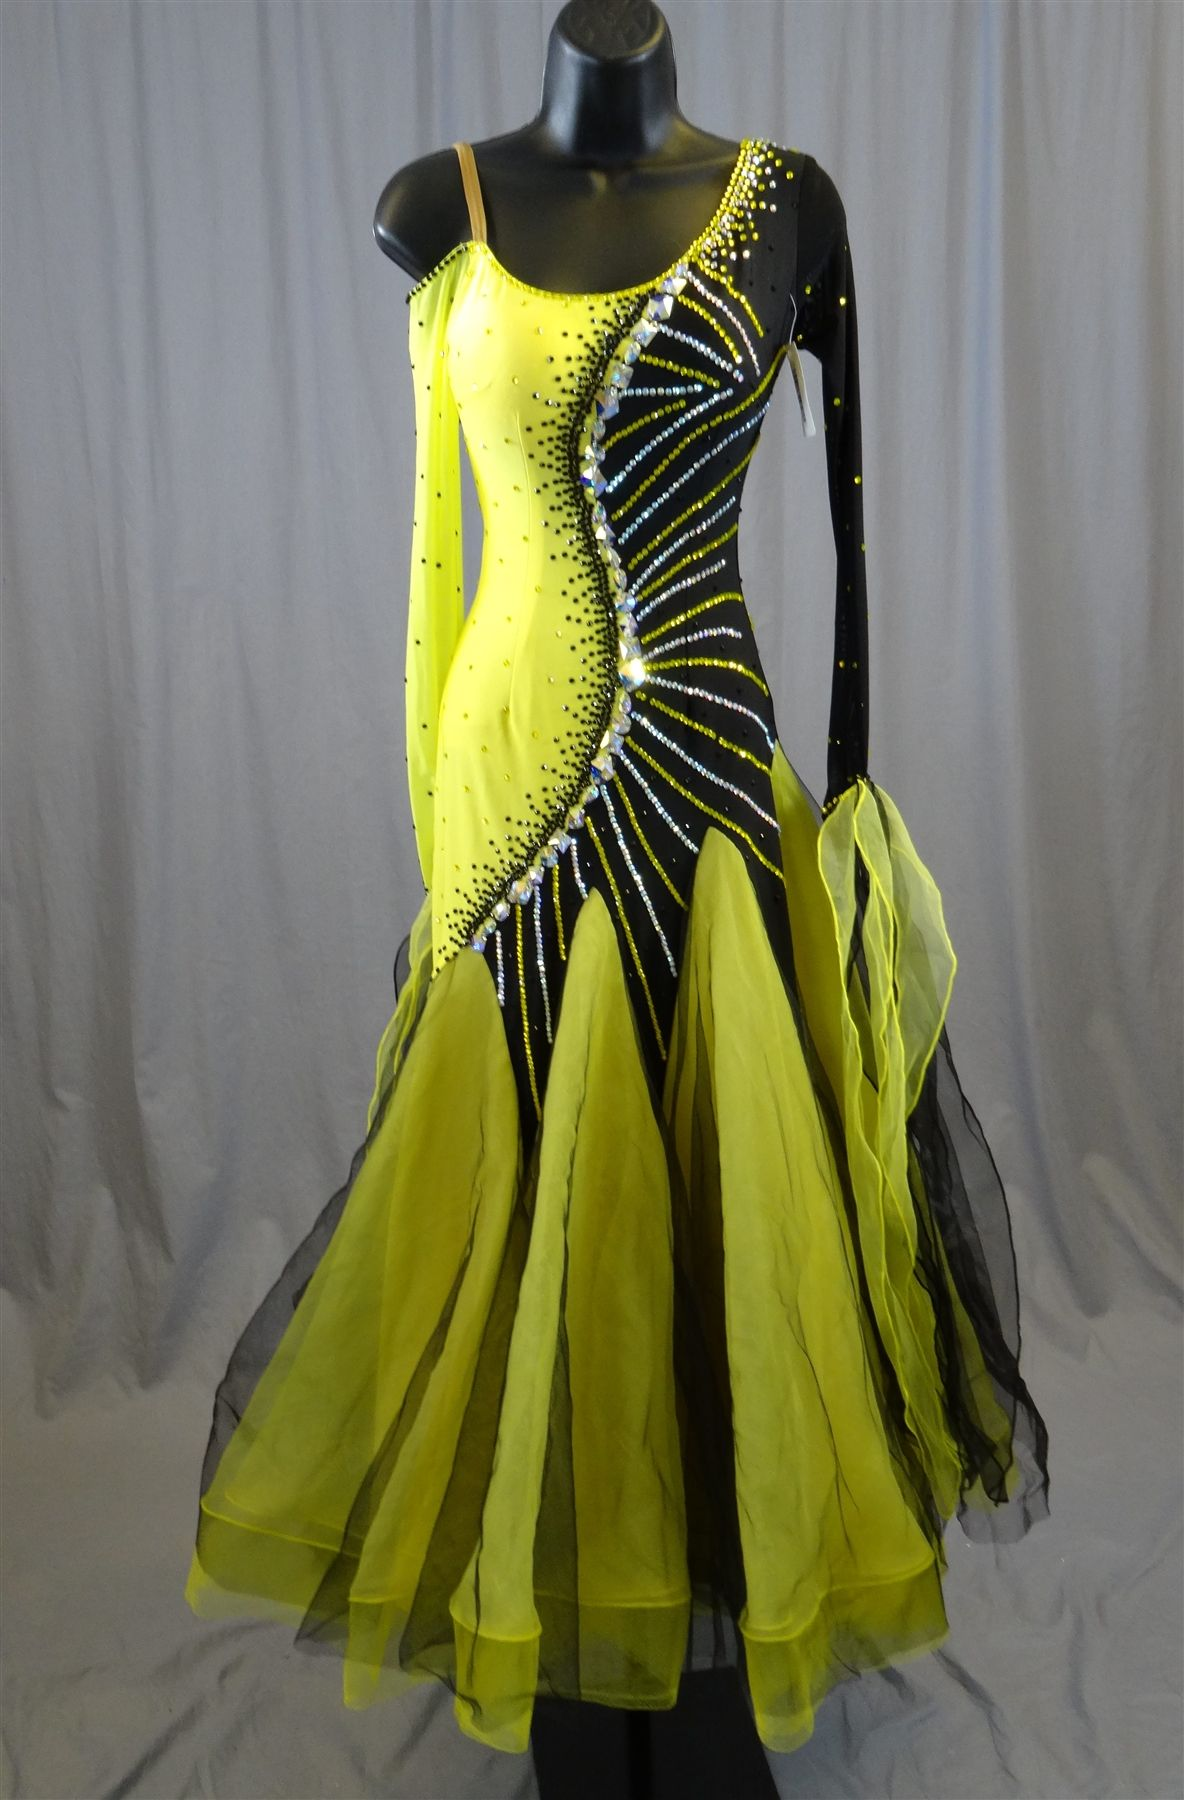 Elegant Black & Yellow Ballroom Dress | Dance dresses